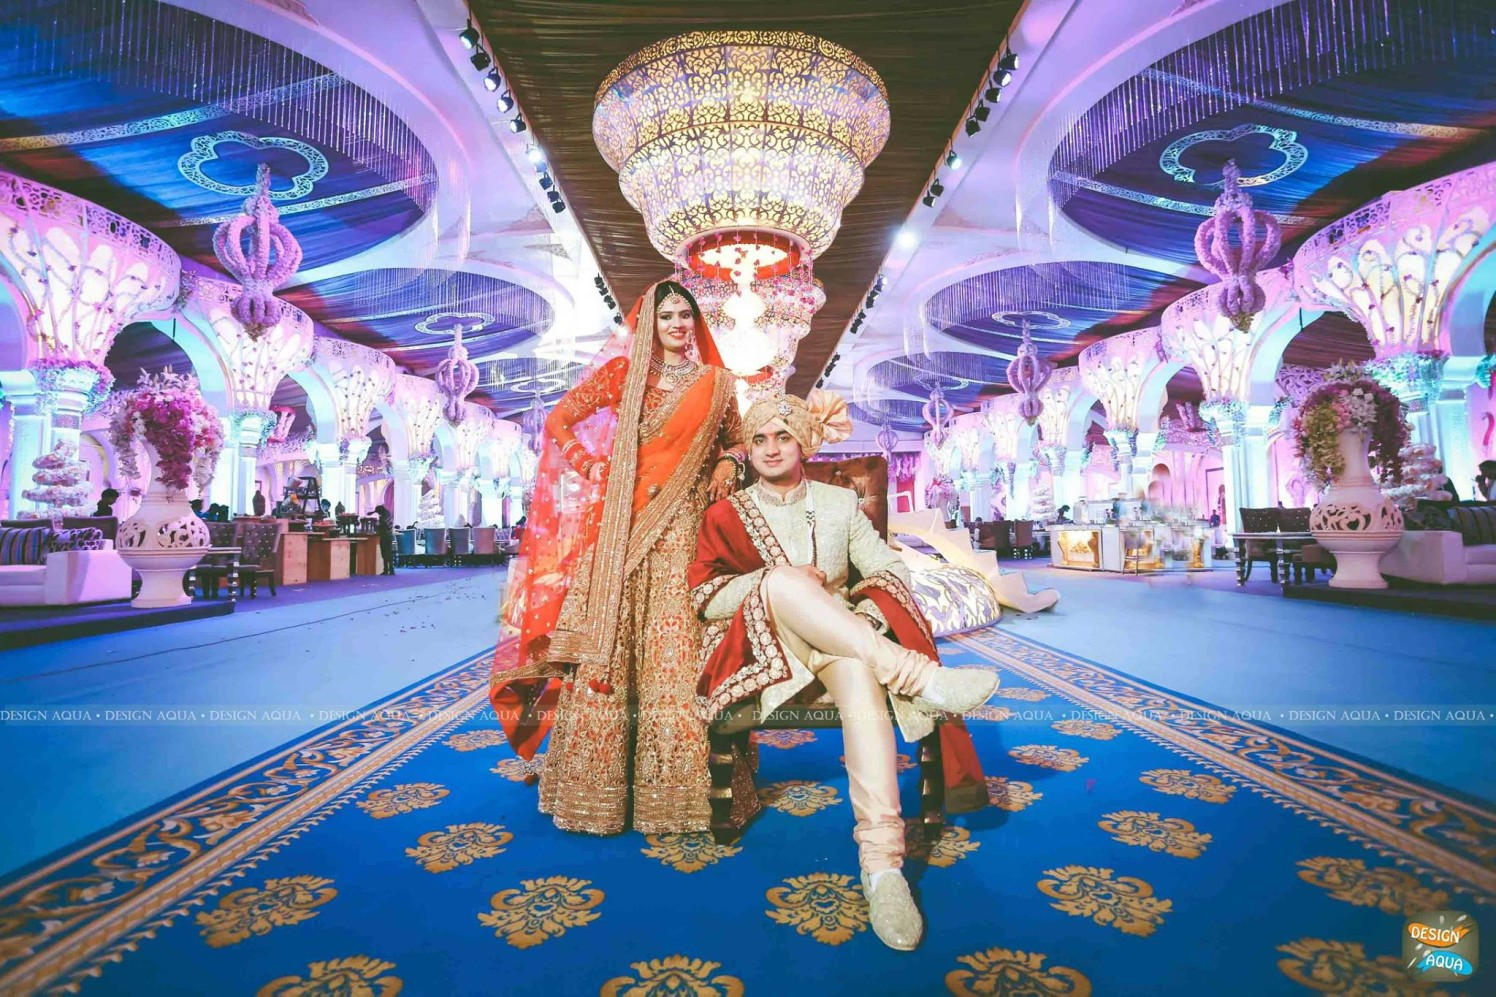 Orange Lehenga With Golden Threadwork Going Well With the Cream Sherwani of the Groom by Priyanka Kamboj Wedding-photography Groom-wear-and-accessories Wedding-dresses Wedding-decor | Weddings Photos & Ideas